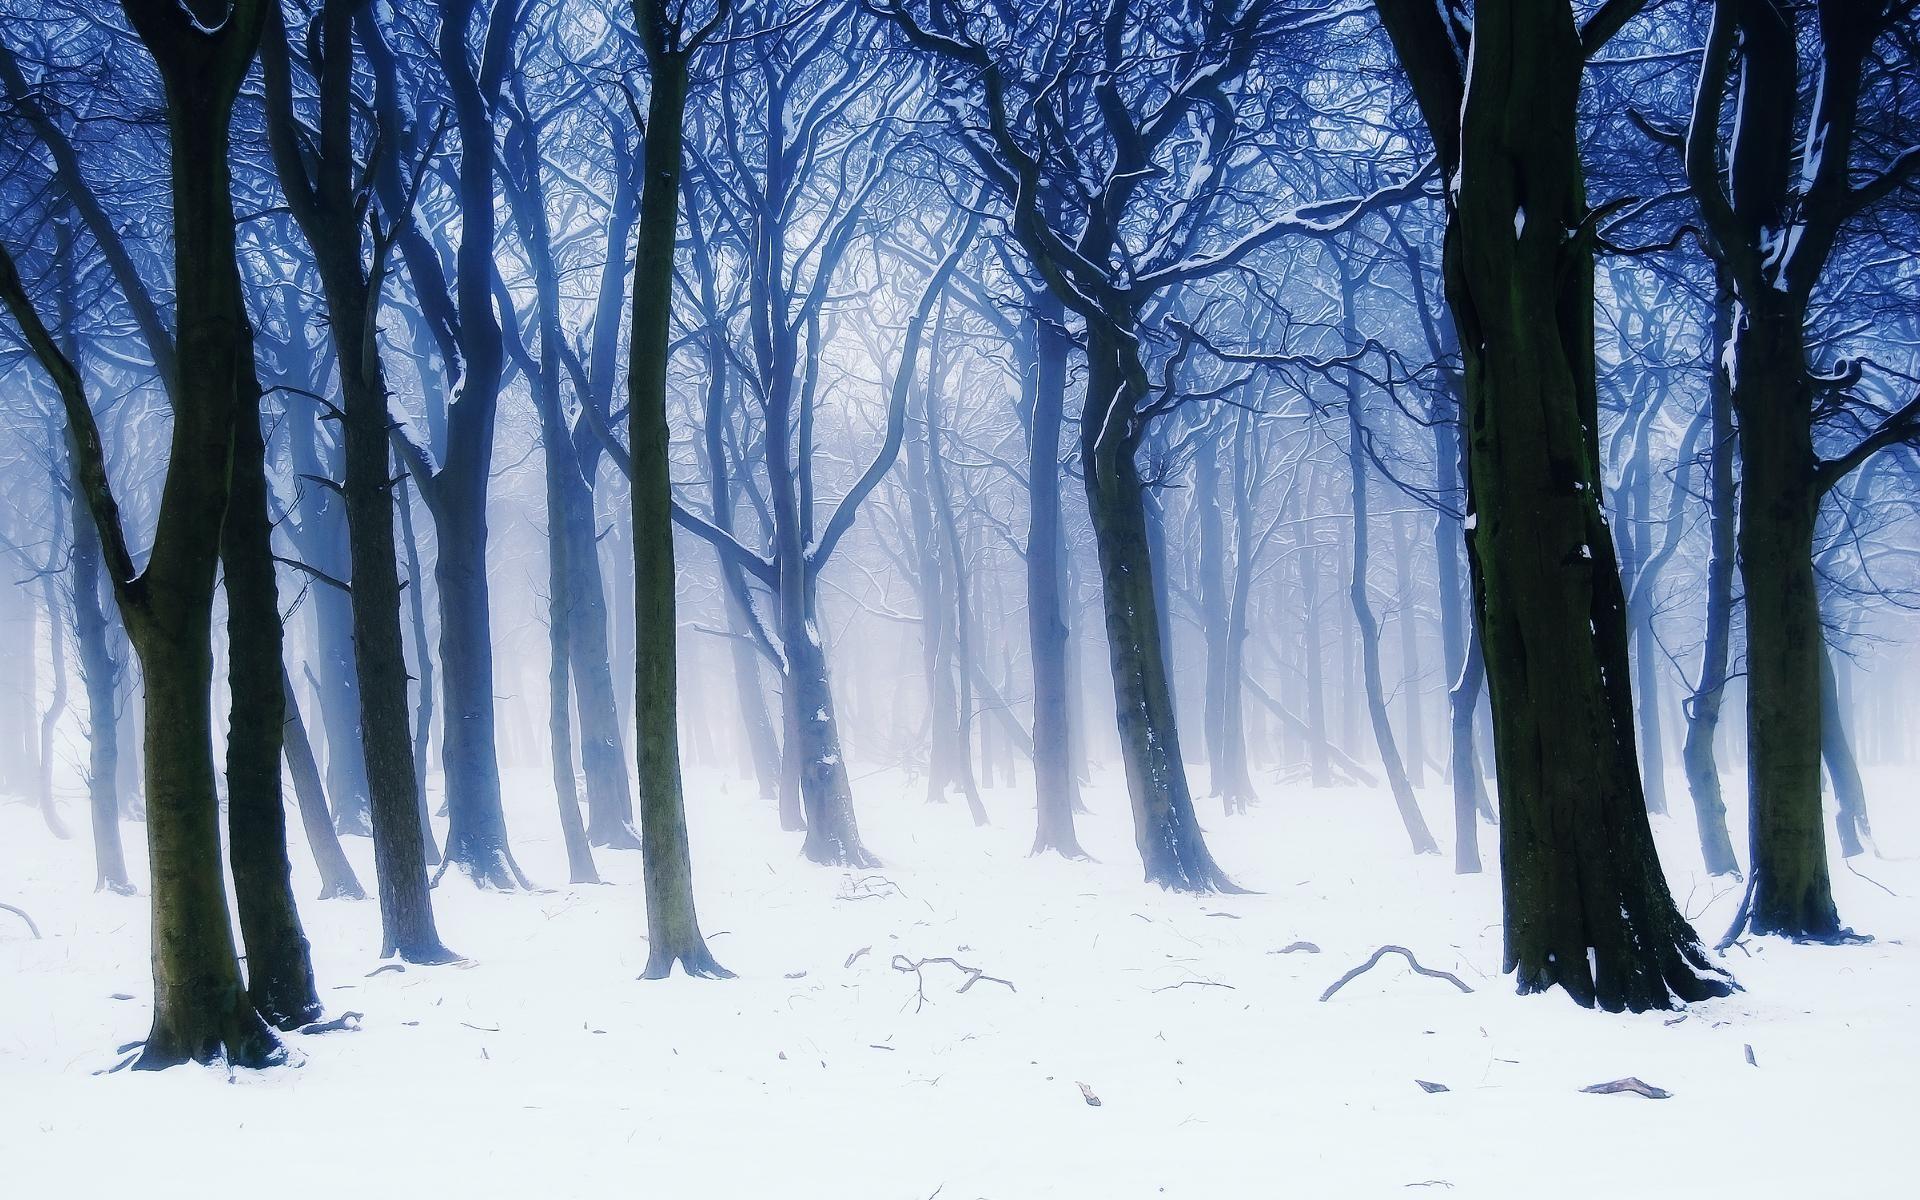 Filename: seasons-winter-trees-fir-snow-nature-wallpaper-1.jpg